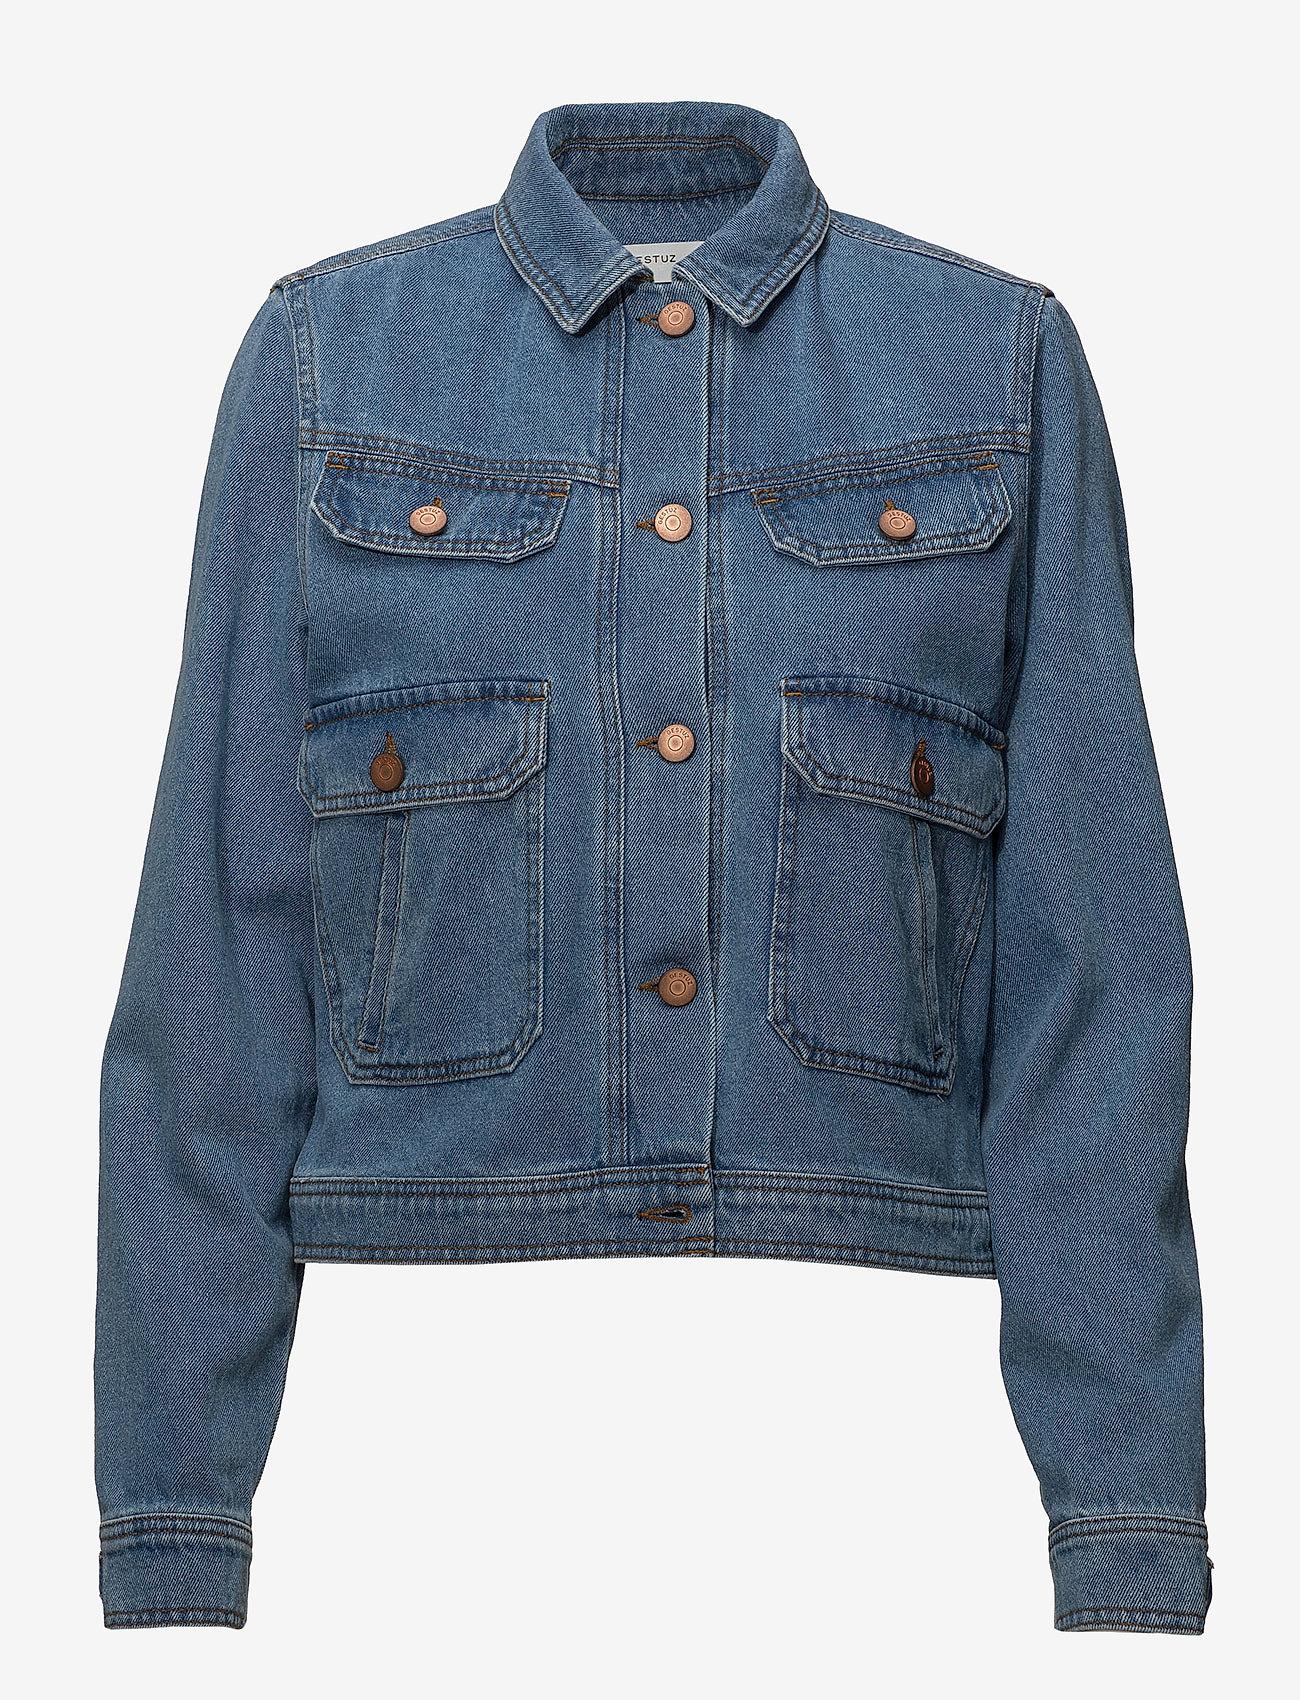 Gestuz - Jenelle jacket MA18 - denim jackets - medium blue